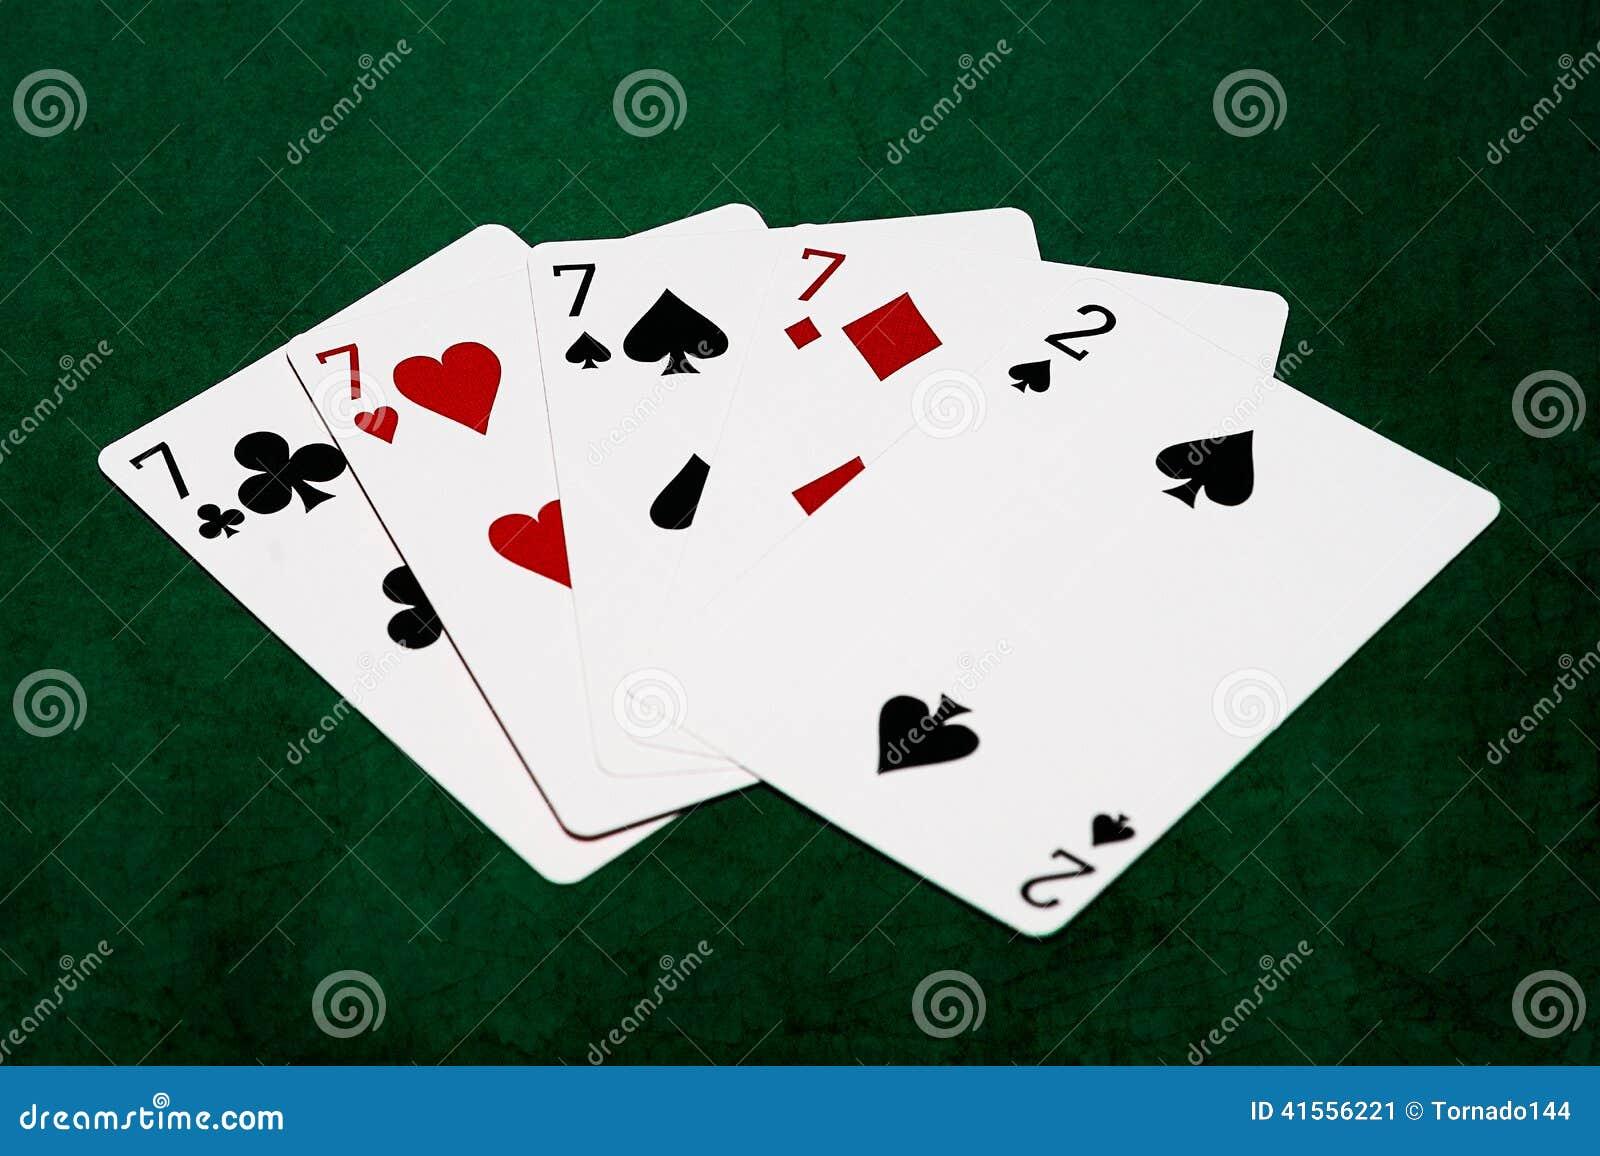 Poker 4 of a kind